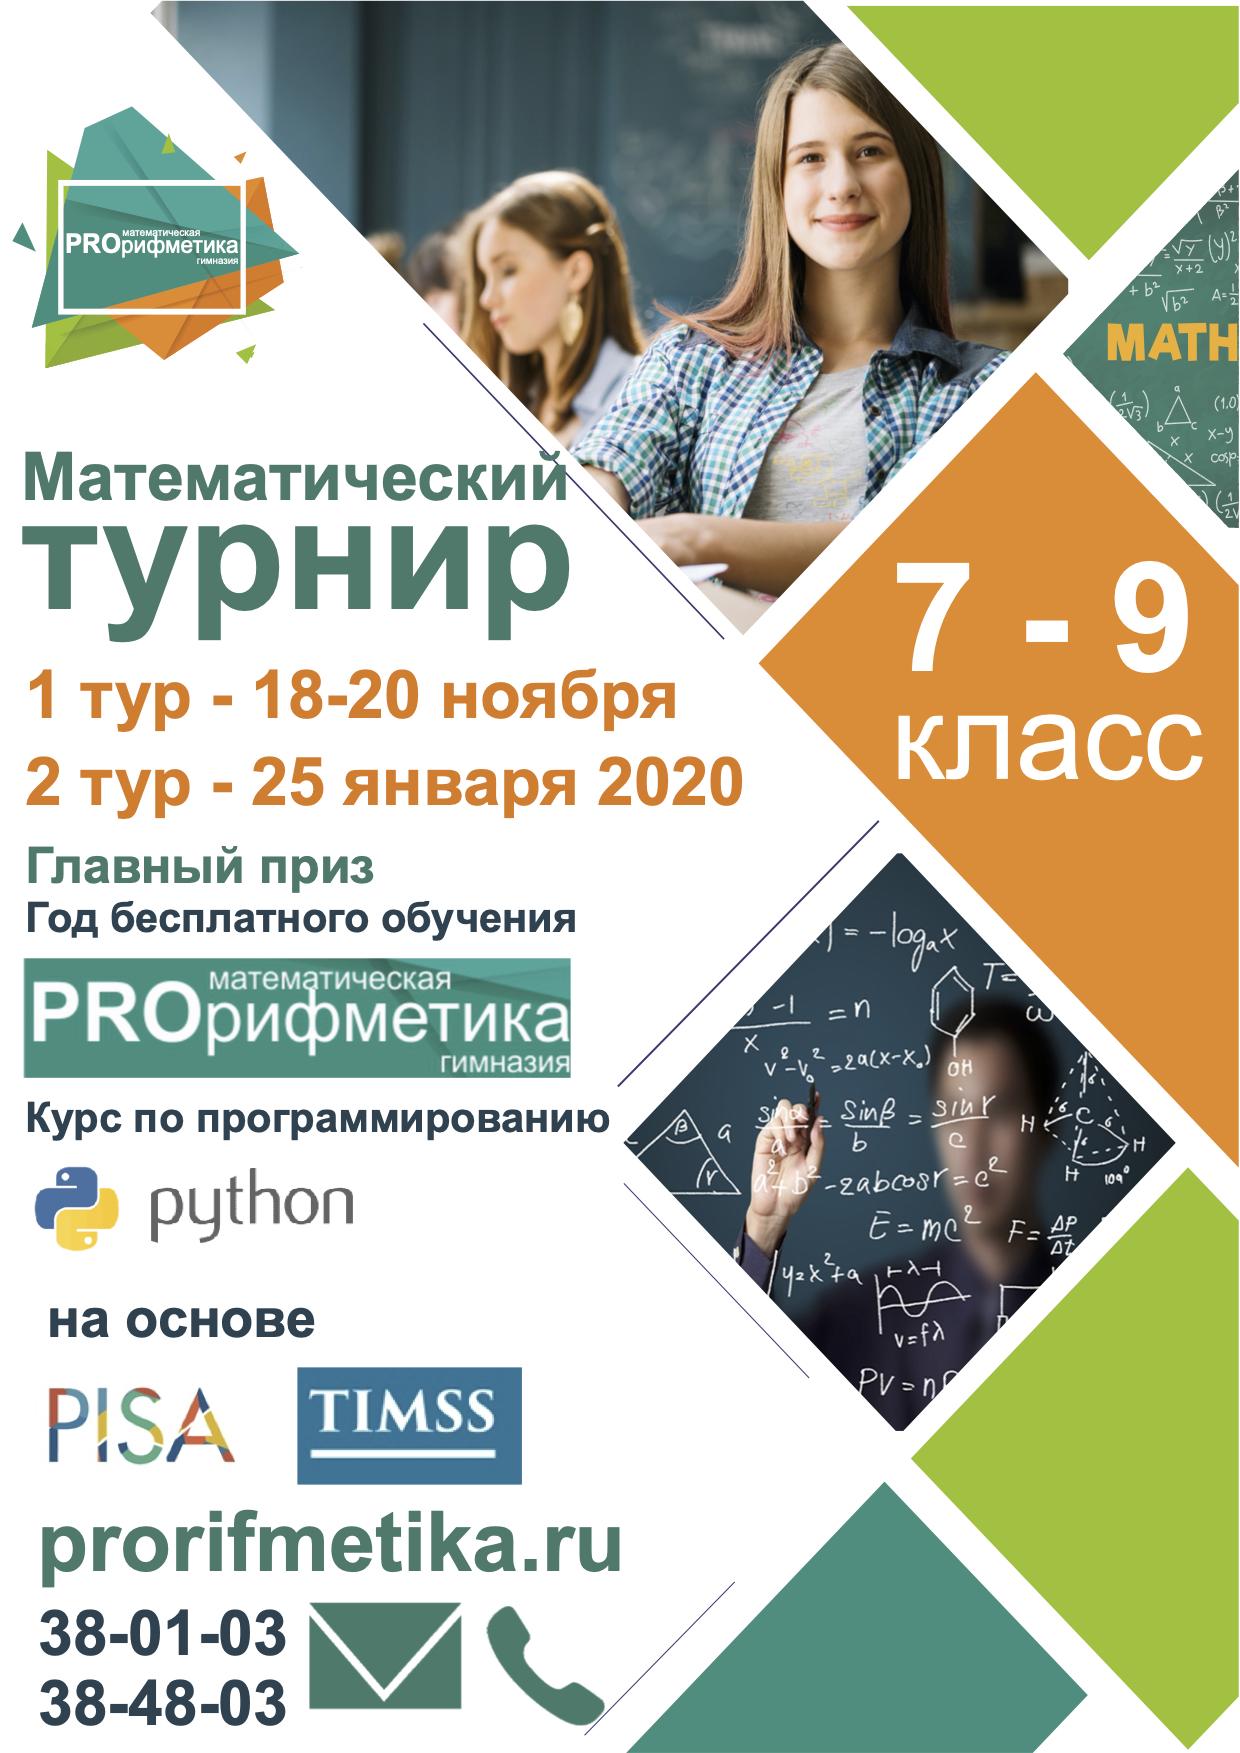 математический турнир 7-9